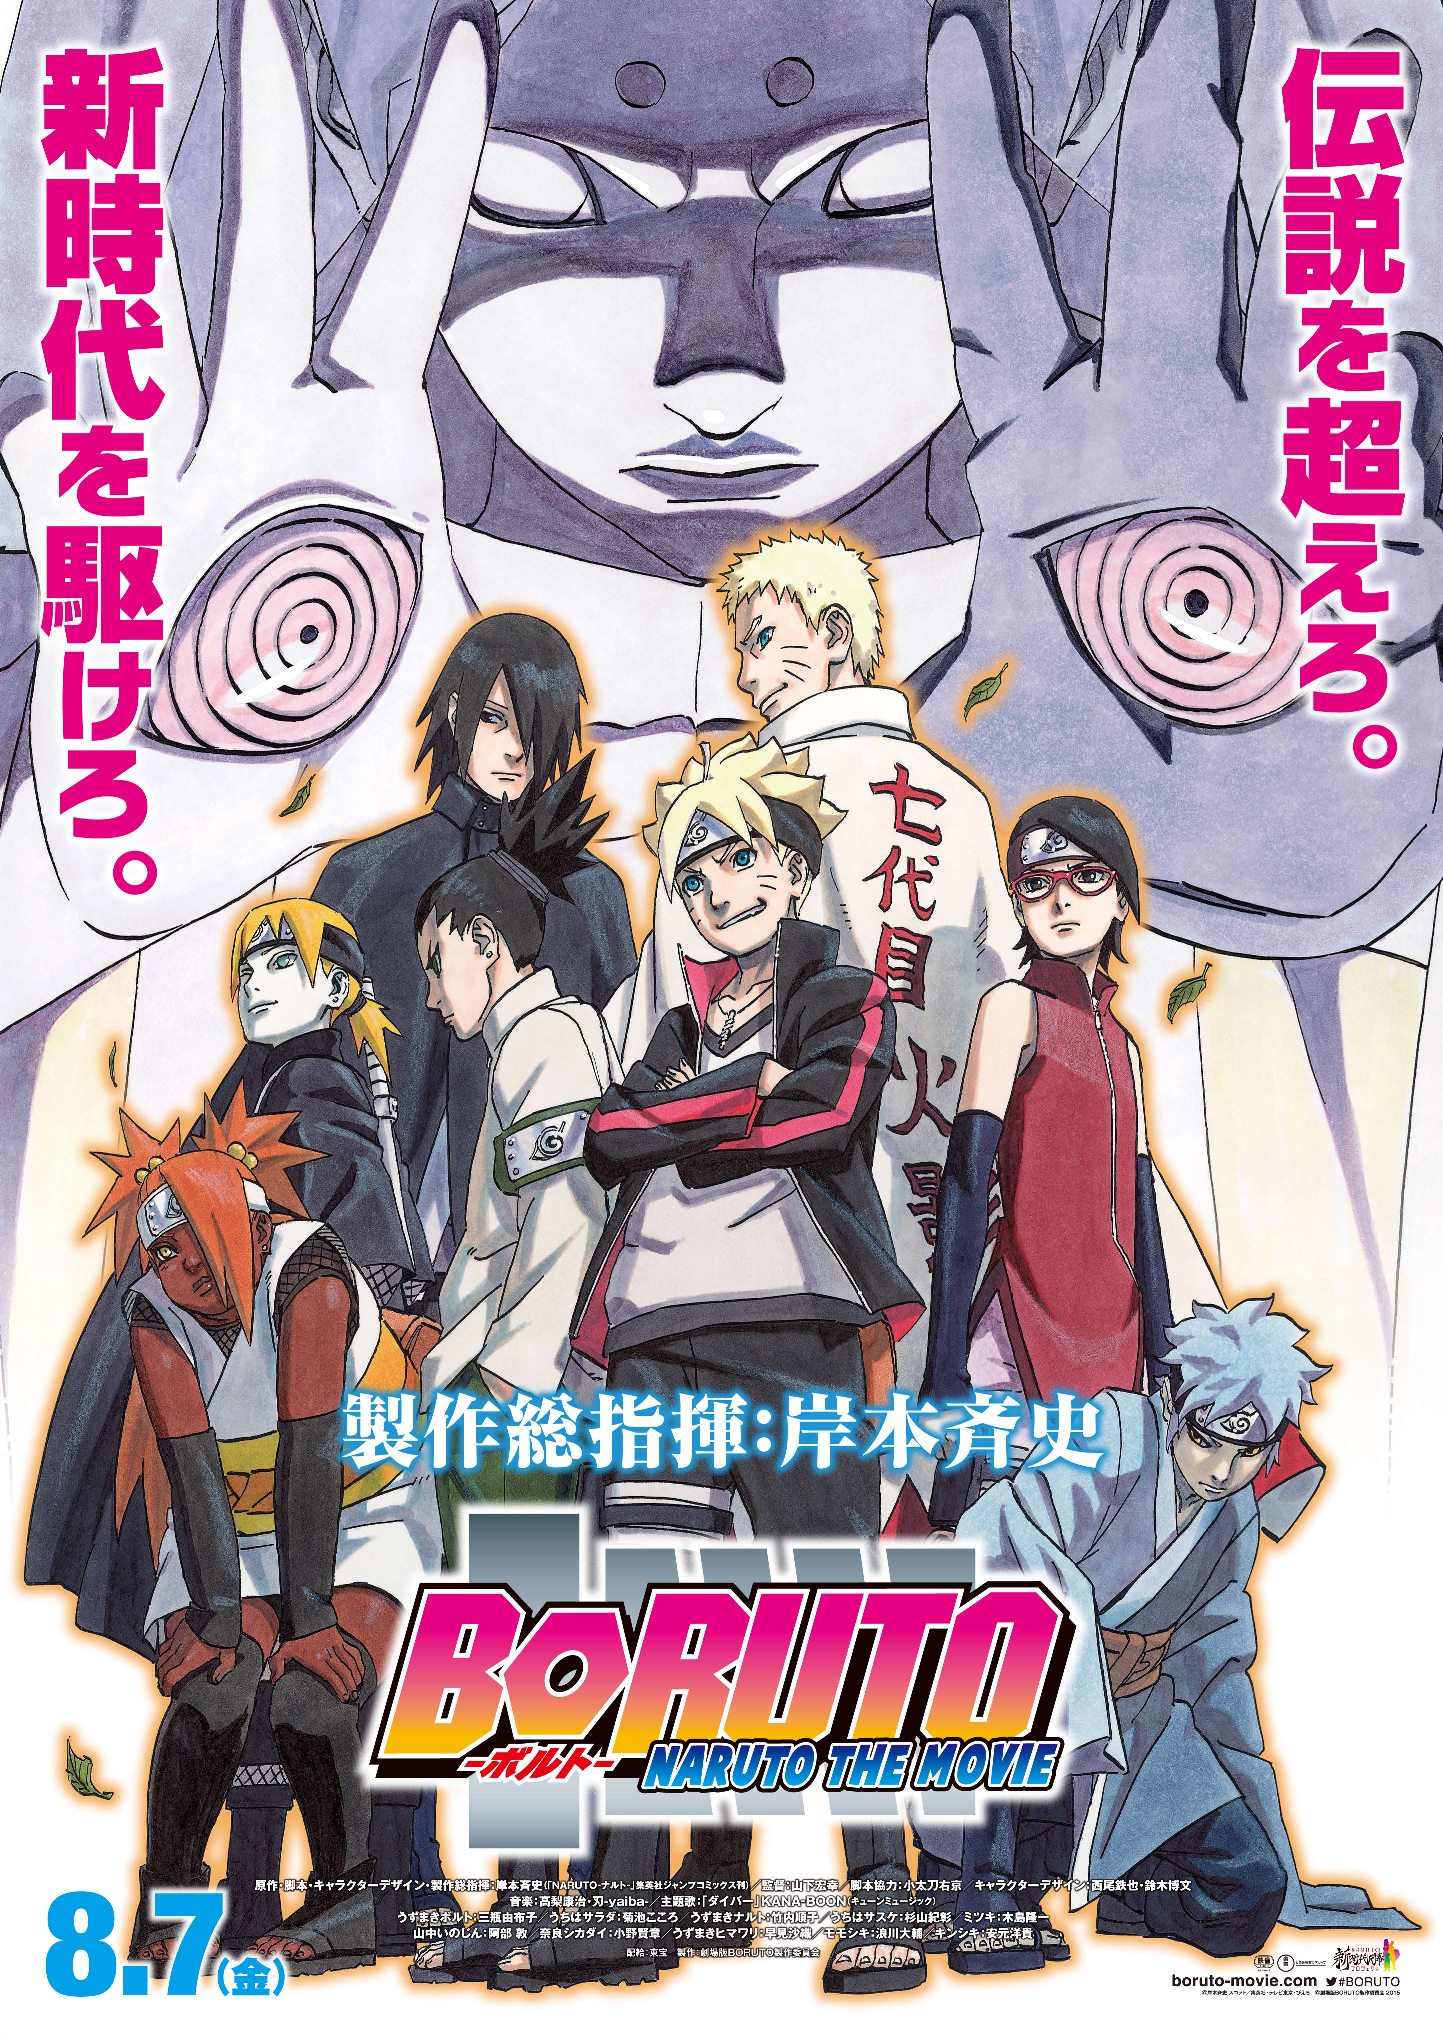 Naruto Shippuden Is Finally Ending Meaning Boruto Isn't Too Far Away